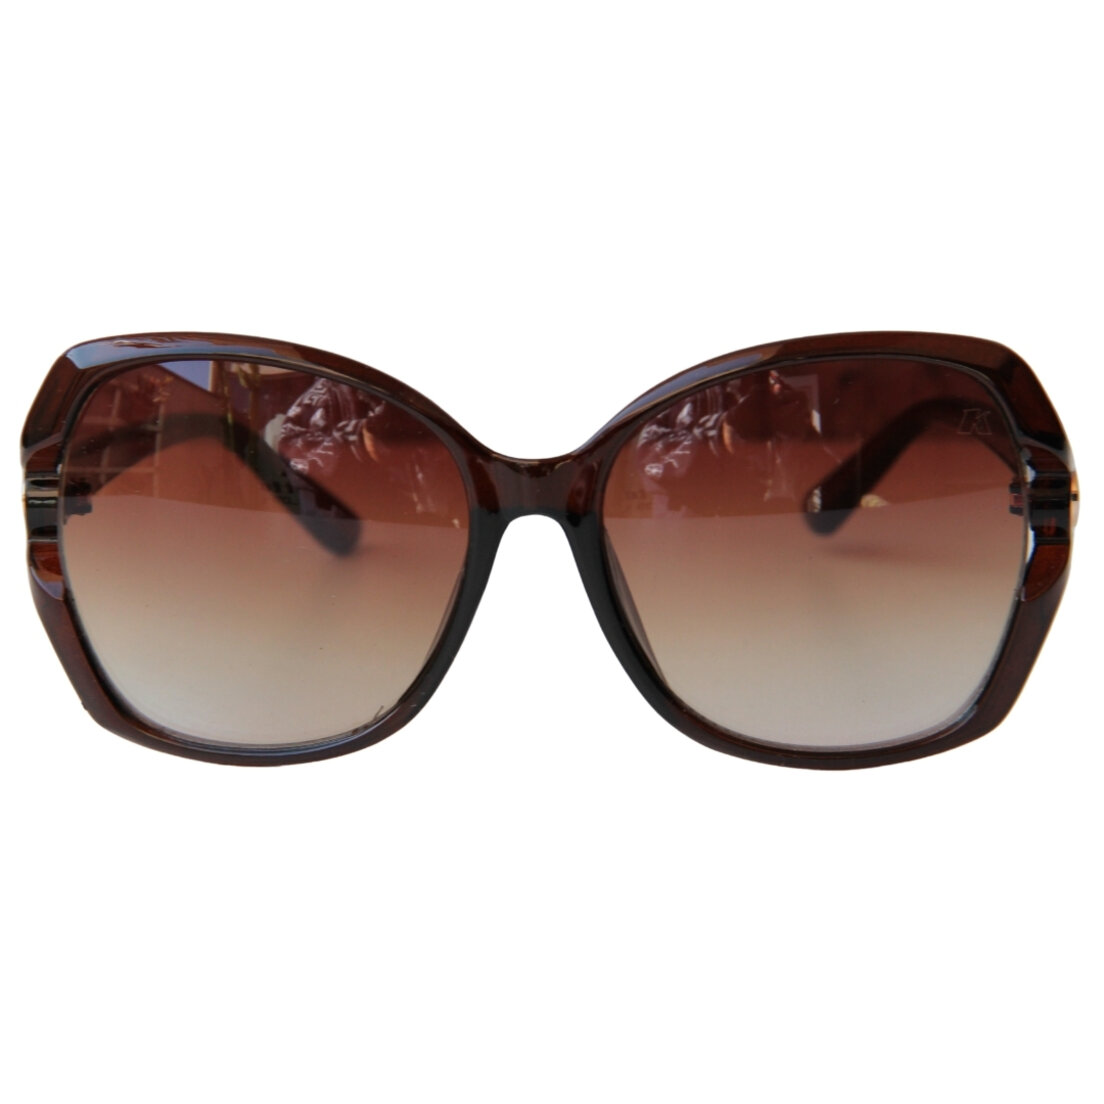 OUTLET - Óculos de Sol Khatto Square - Marrom